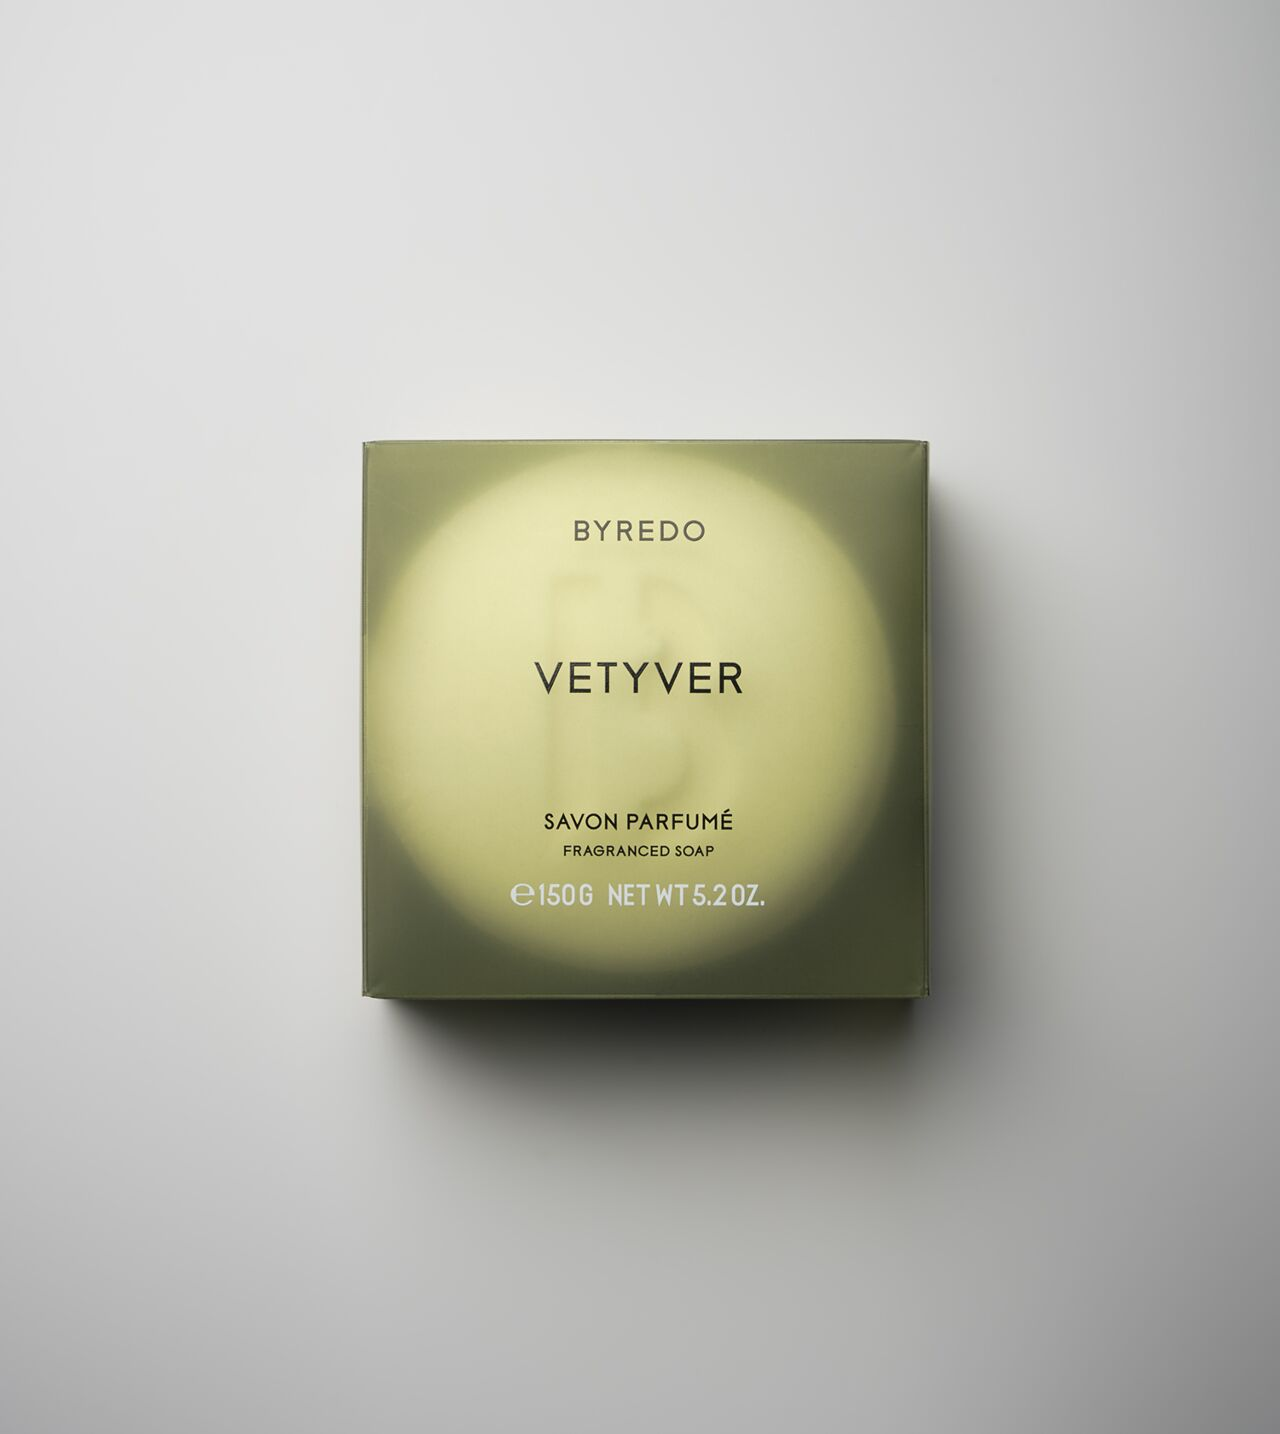 Picture of Byredo Vetyver Hand Soap 150g